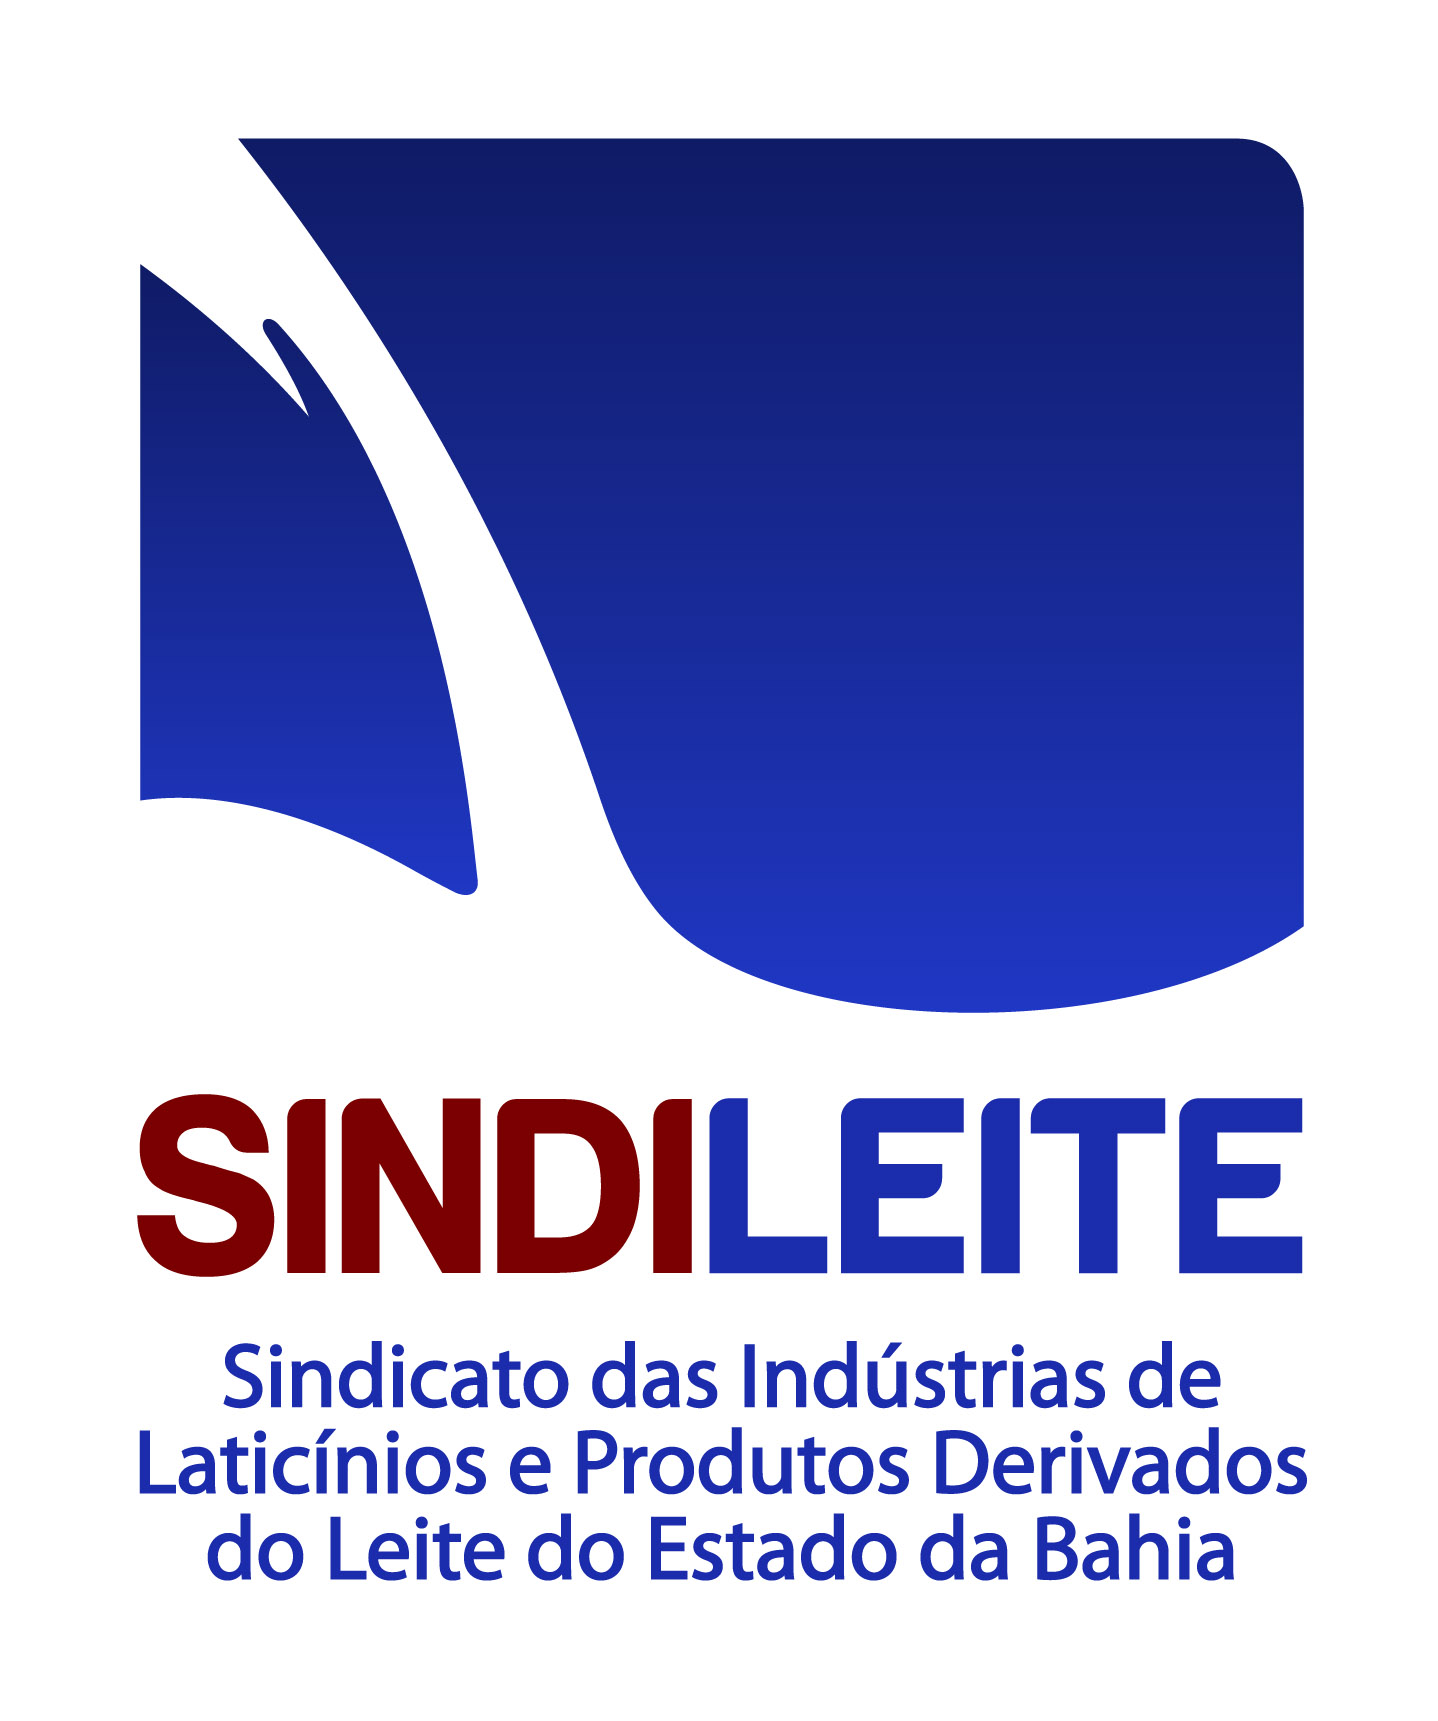 Sindicato das Indústrias de Laticínios e Produtos Derivados do Leite do Estado da Bahia